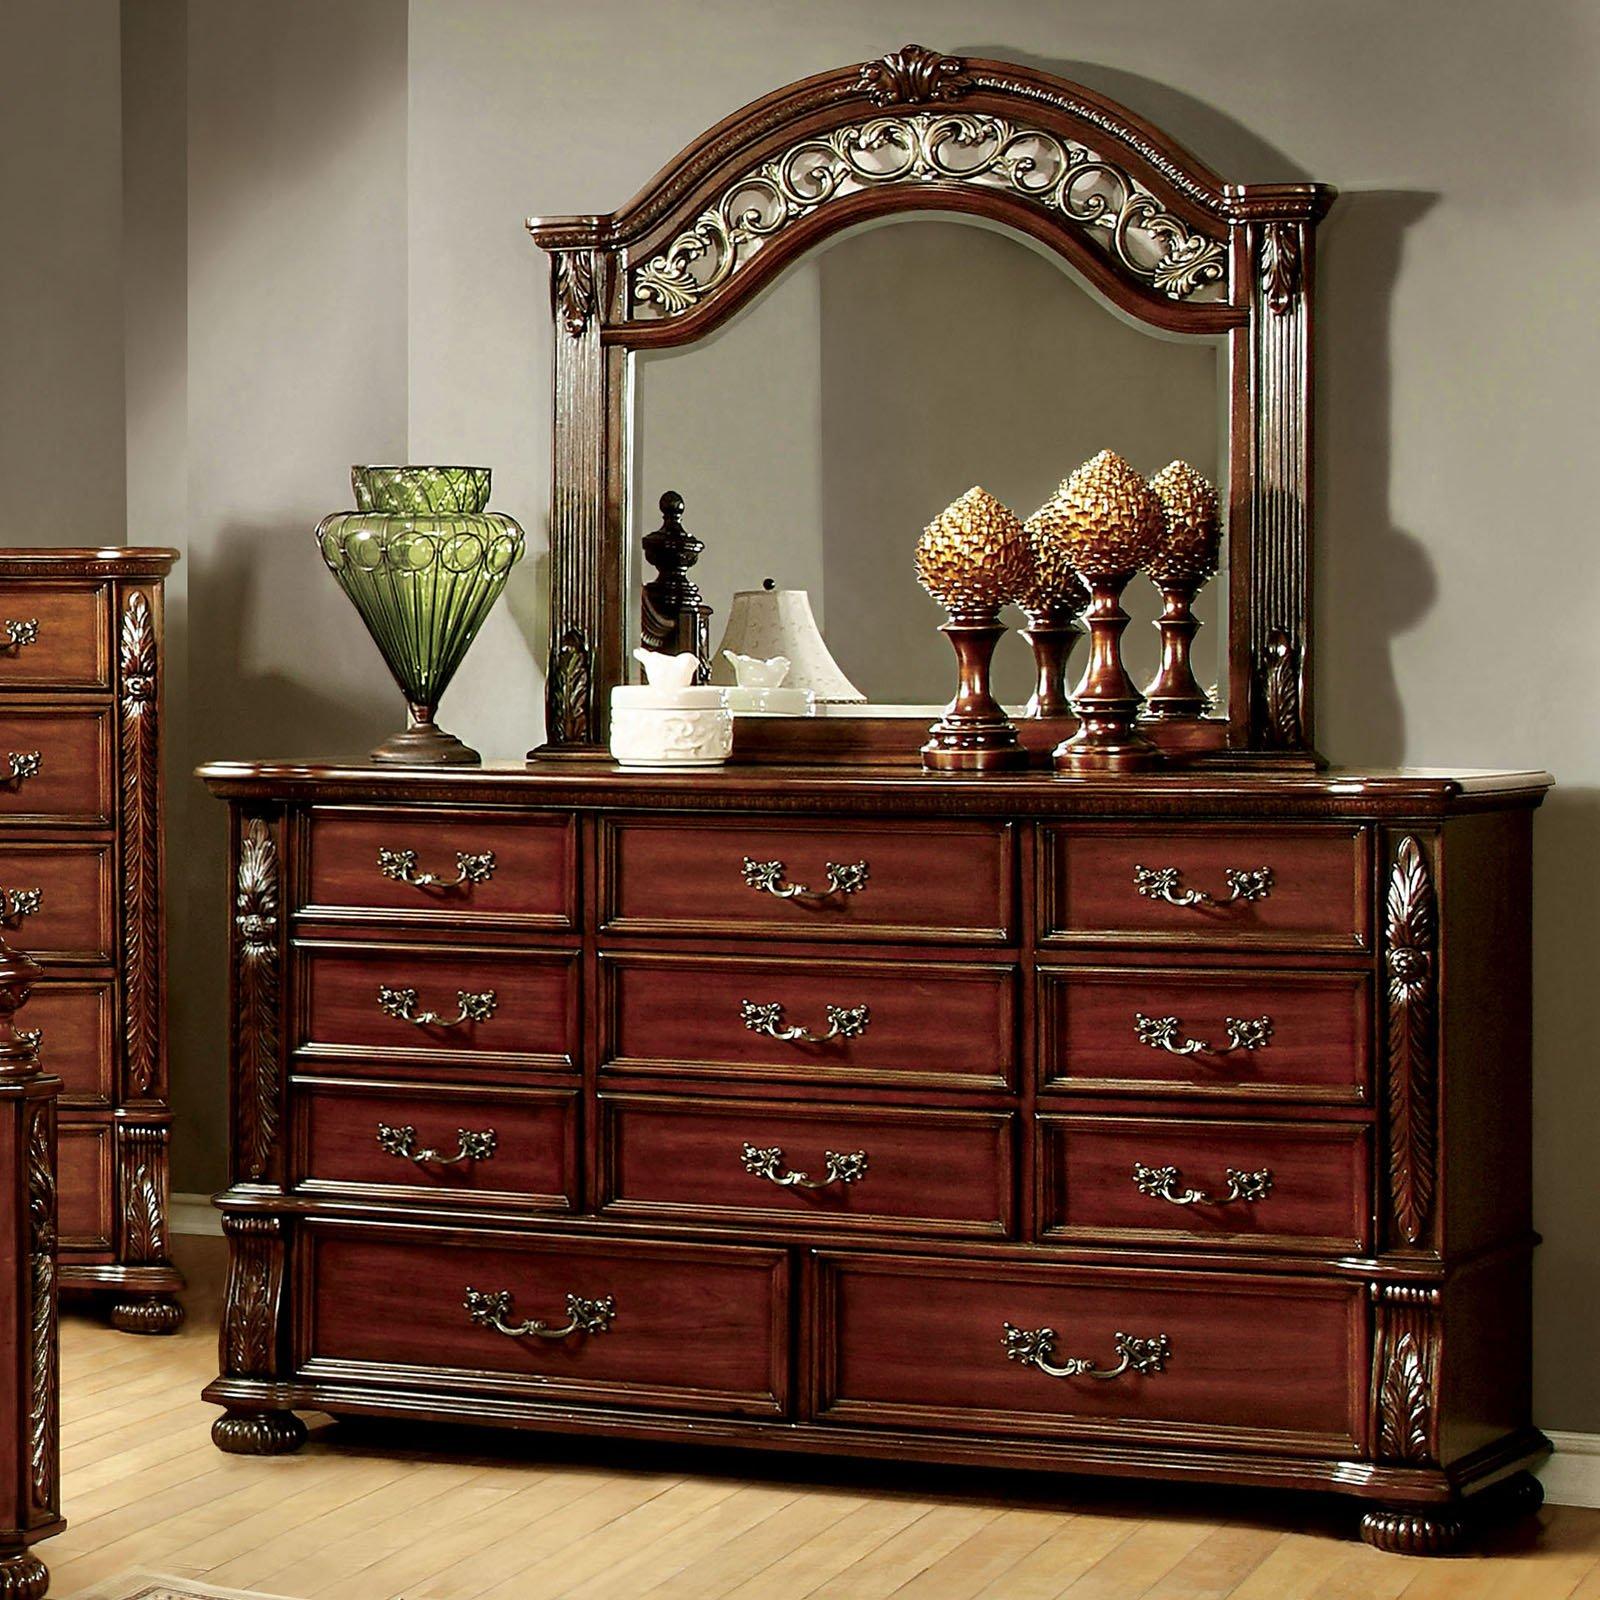 Enitial Lab Furniture of America Walters Lane 11 Drawer D...